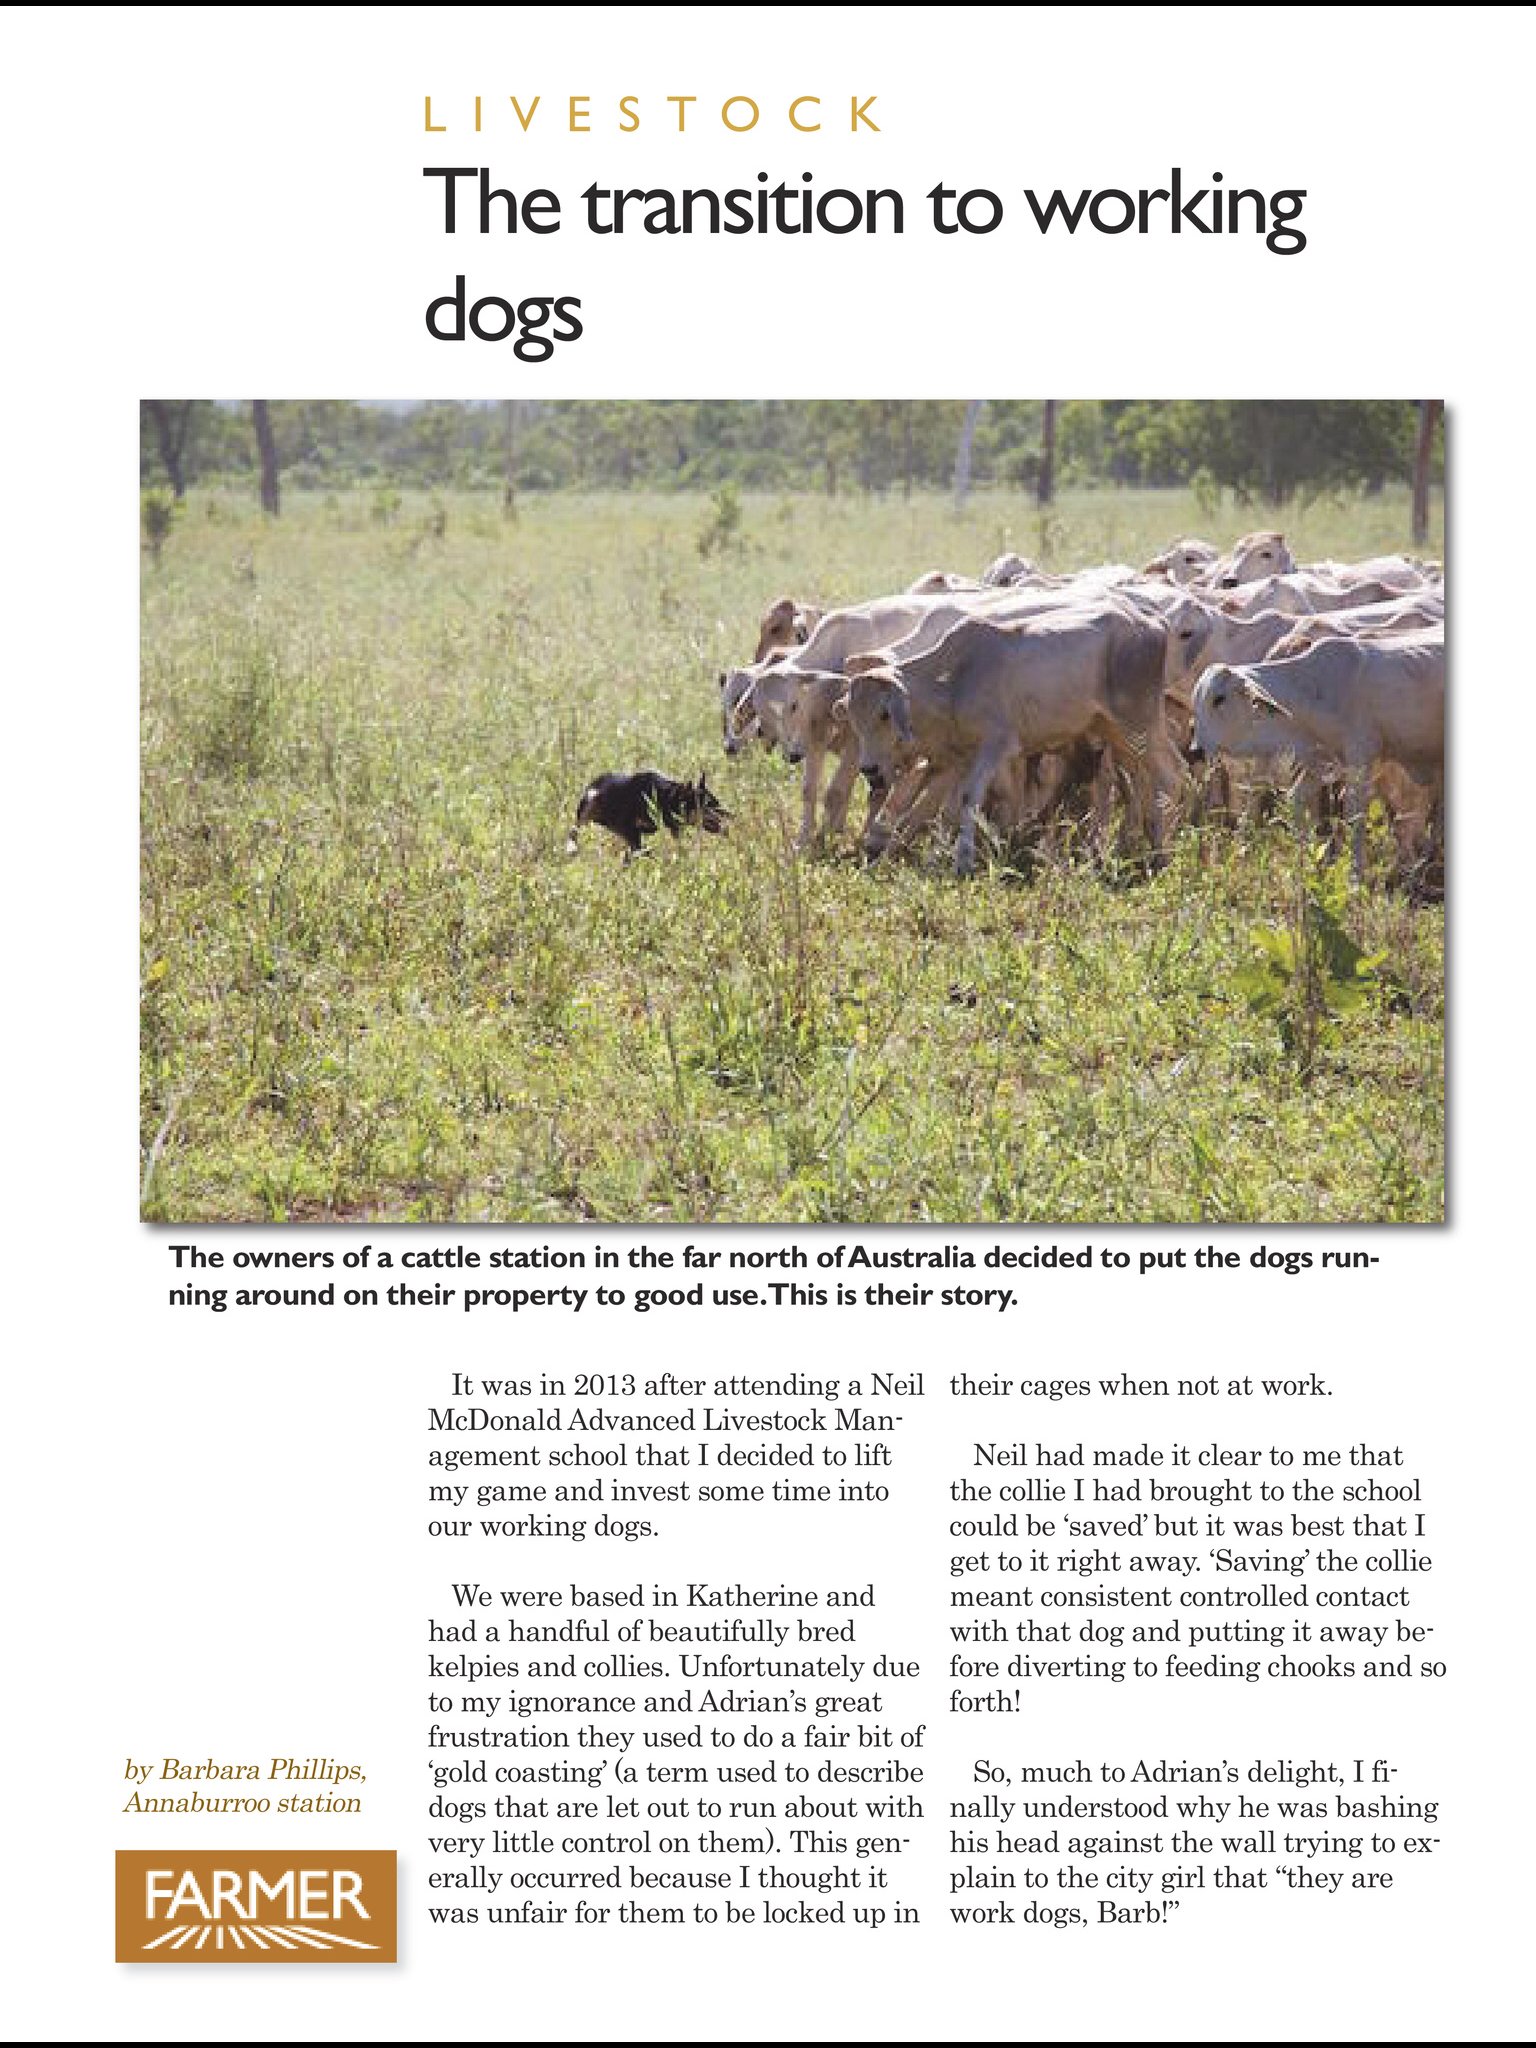 Working dogs on an Australian cattle station